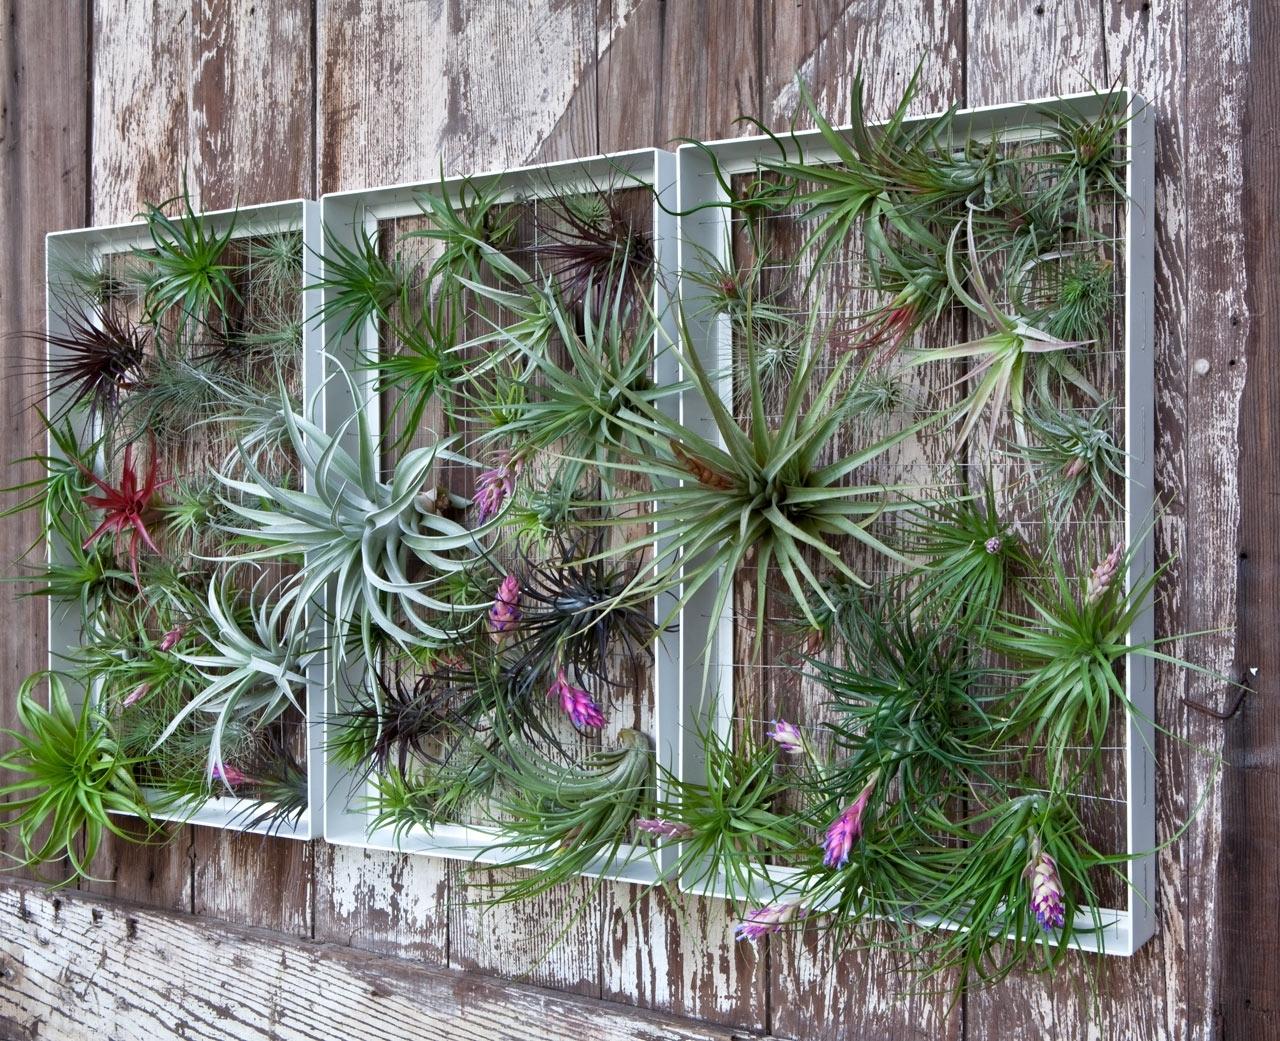 Living Wall Art Vertical Garden Framesairplantman – Design Milk Within Favorite Garden Wall Art (View 11 of 15)